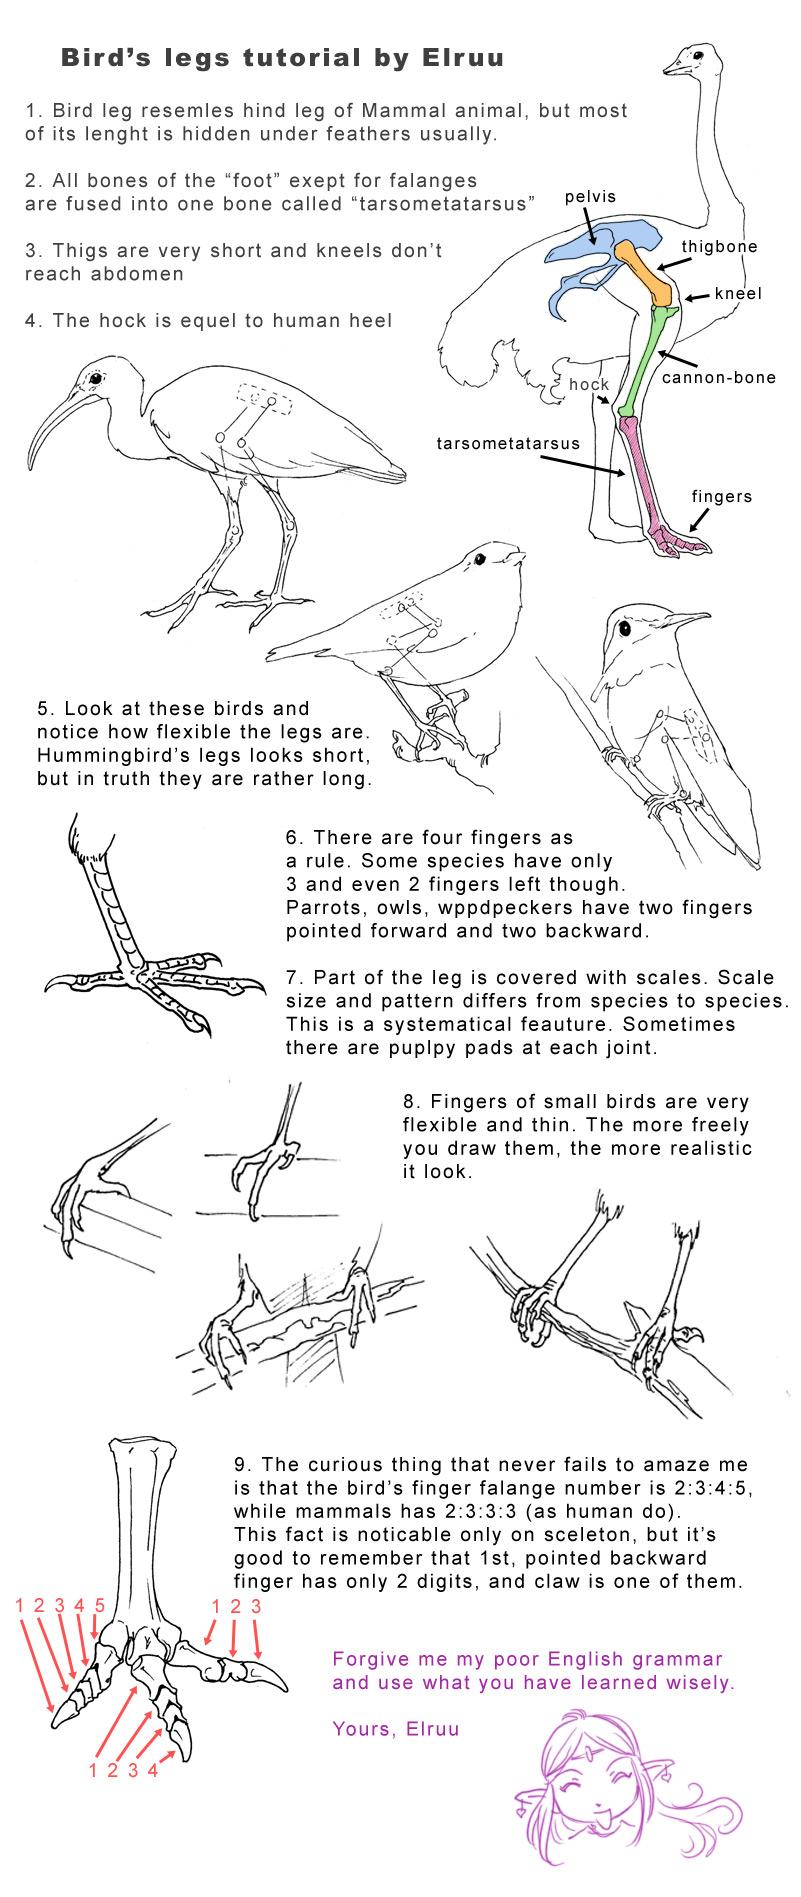 Bird Legs Tutorial By Elruu On DeviantArt